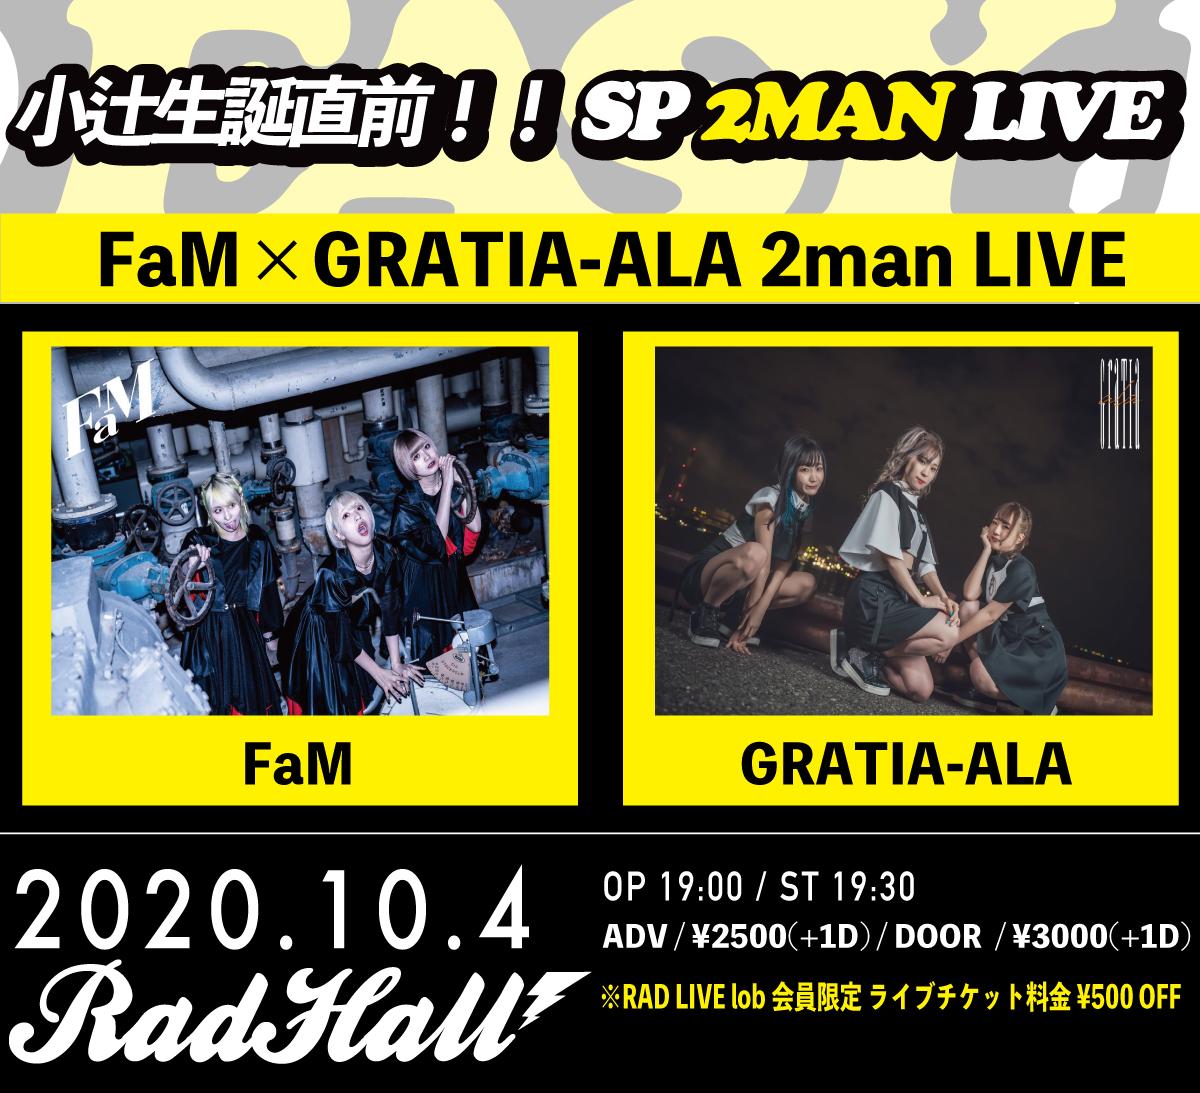 小辻生誕直前!! SP 2MAN LIVE 【FaM x GRATITA-ALA 2MAN LIVE】